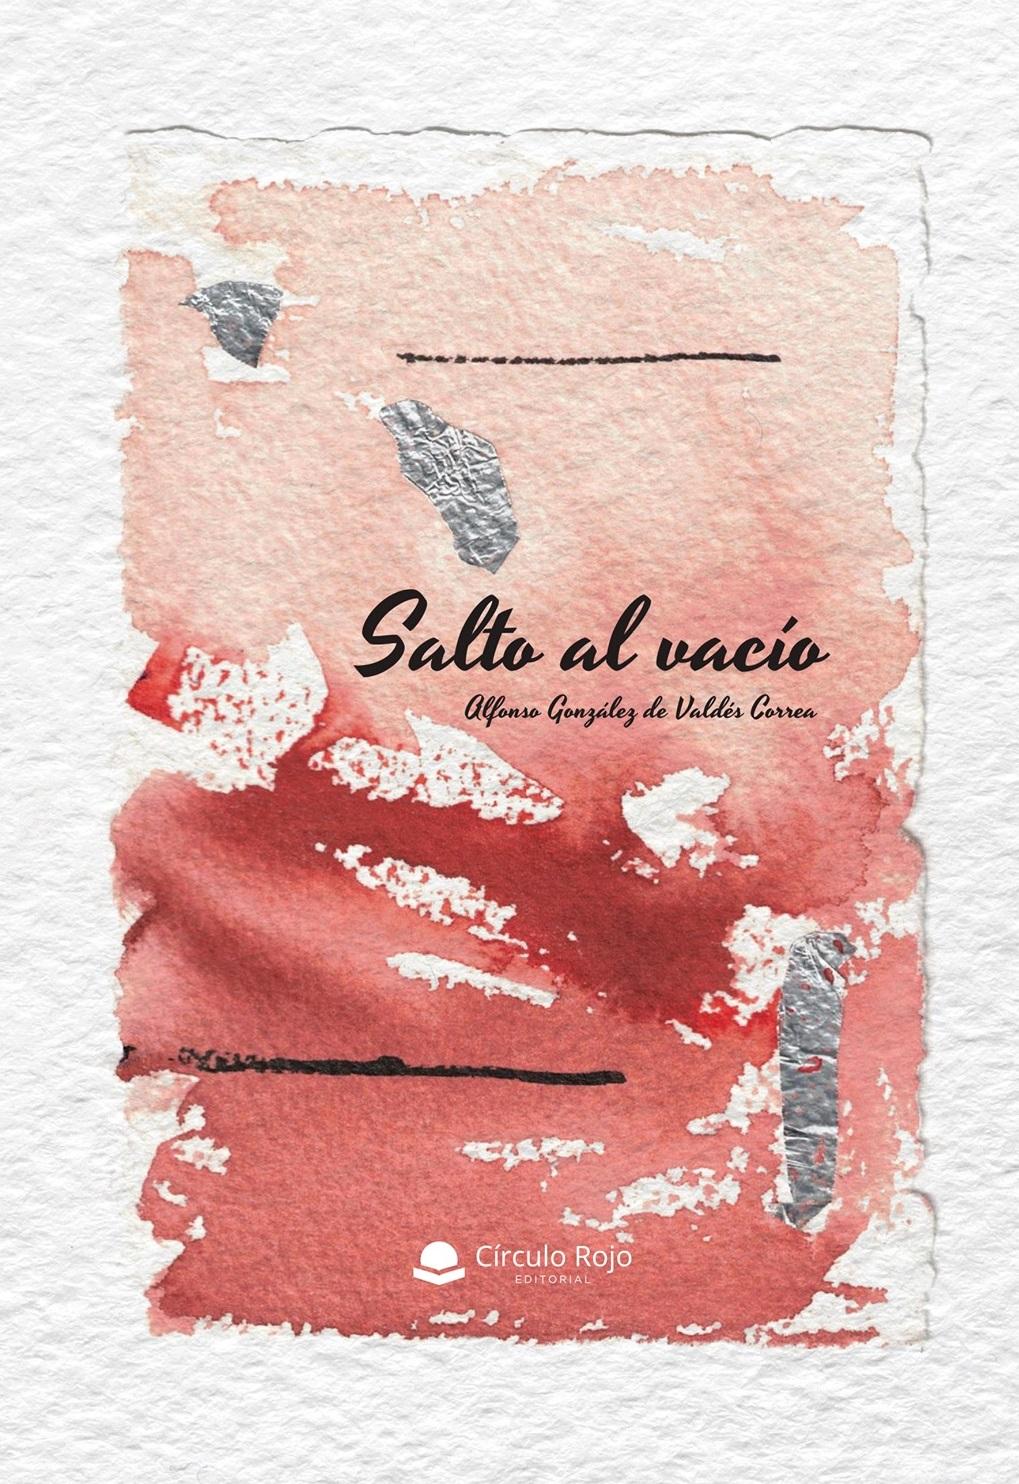 primer libro Alfonso González Valdés